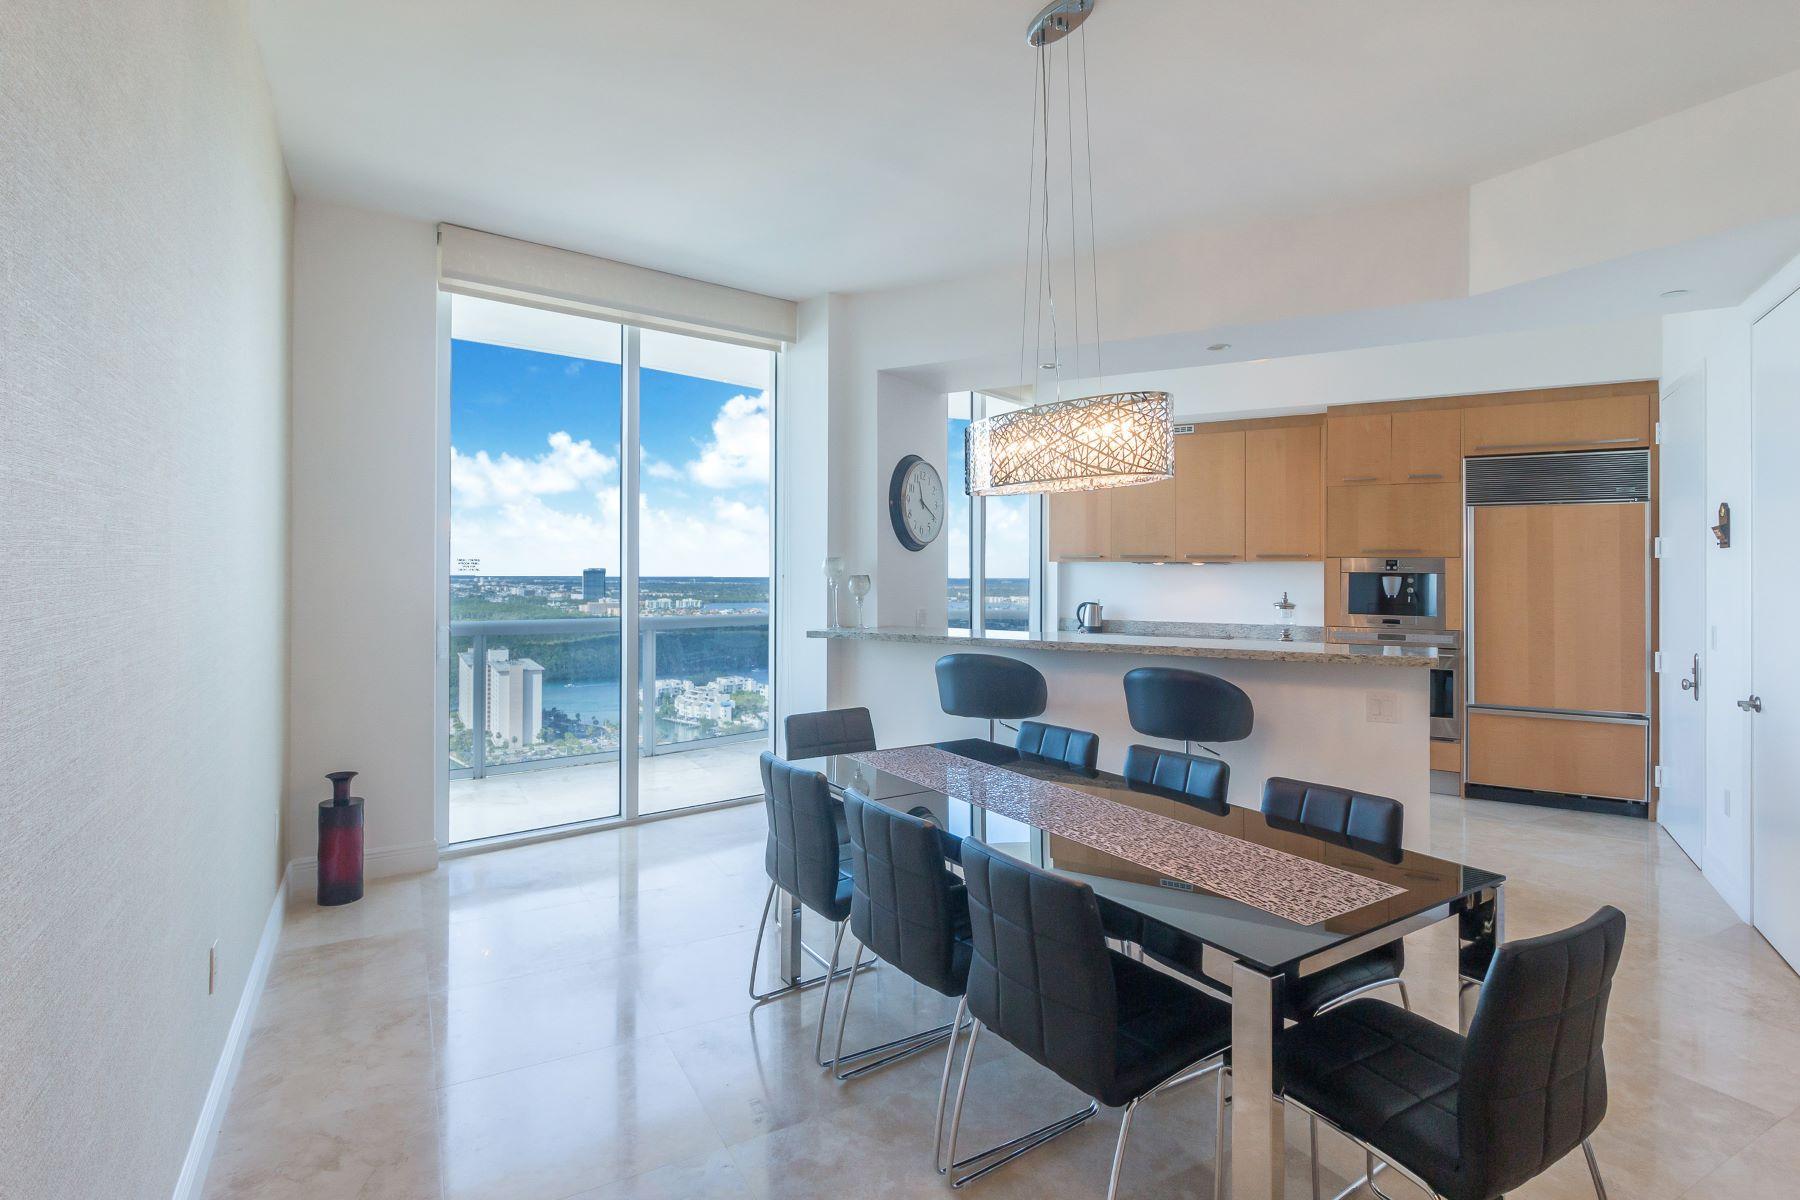 شقة بعمارة للـ Rent في 15811 Collins Ave #3005 15811 Collins Ave 3005, Sunny Isles Beach, Florida, 33160 United States